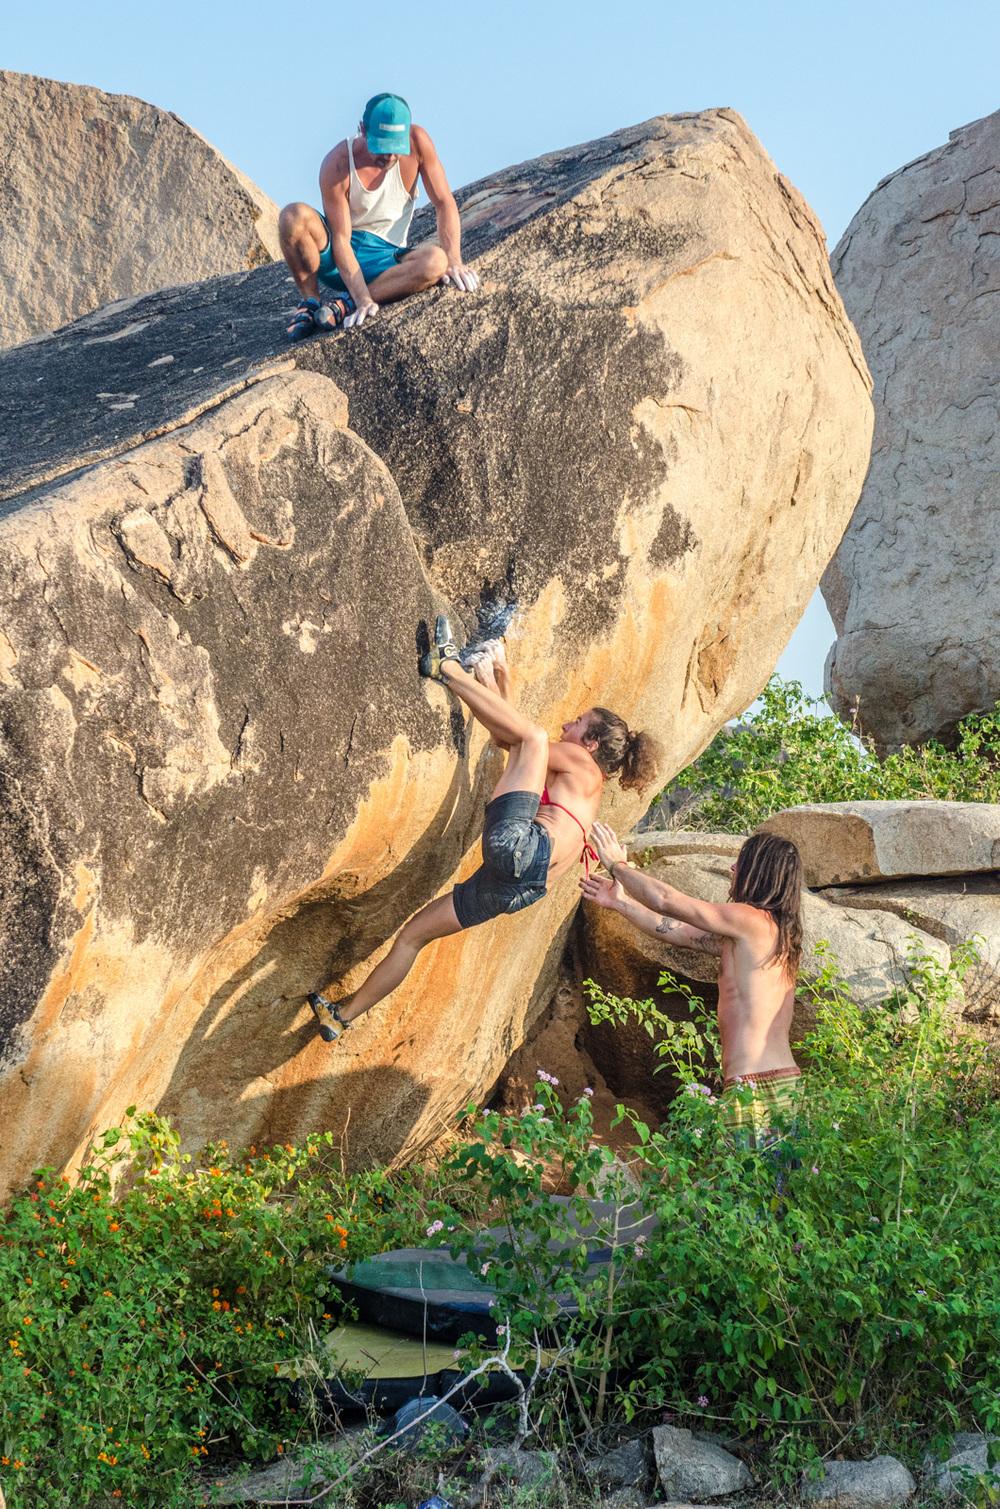 Hampi-India-bouldering-rockclimbing-AmyRolloPhoto-1301.jpg